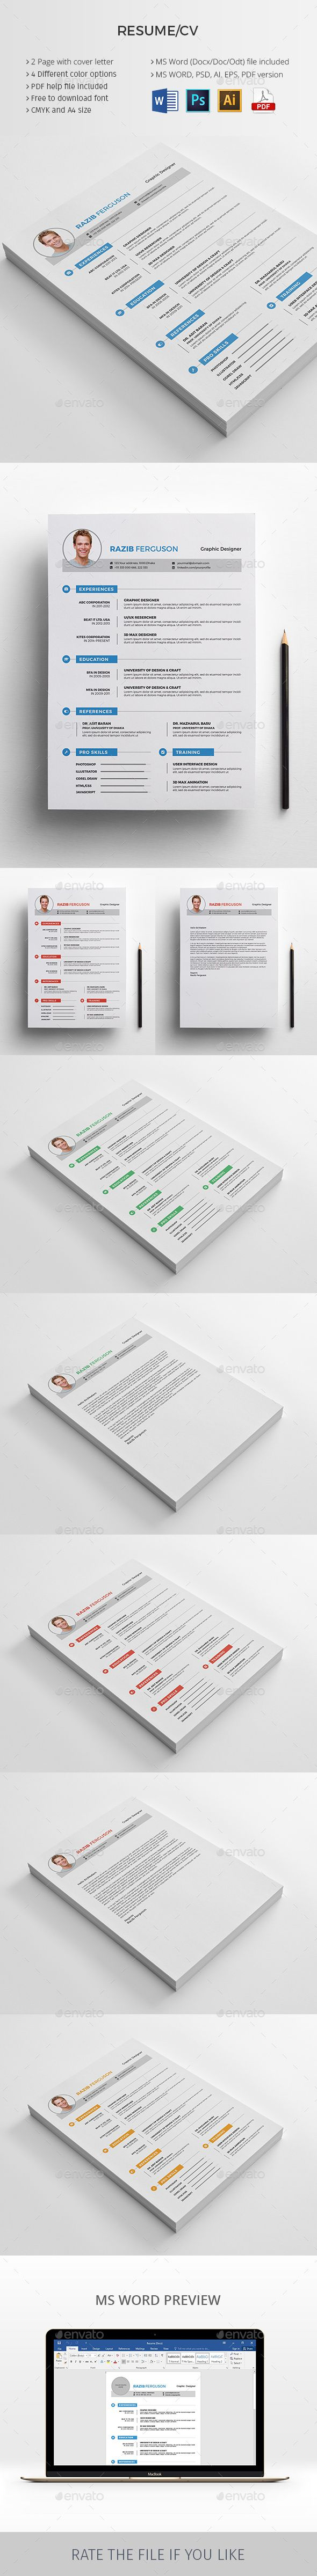 797 Best Resume Cv Templates Images On Pinterest Design Resume